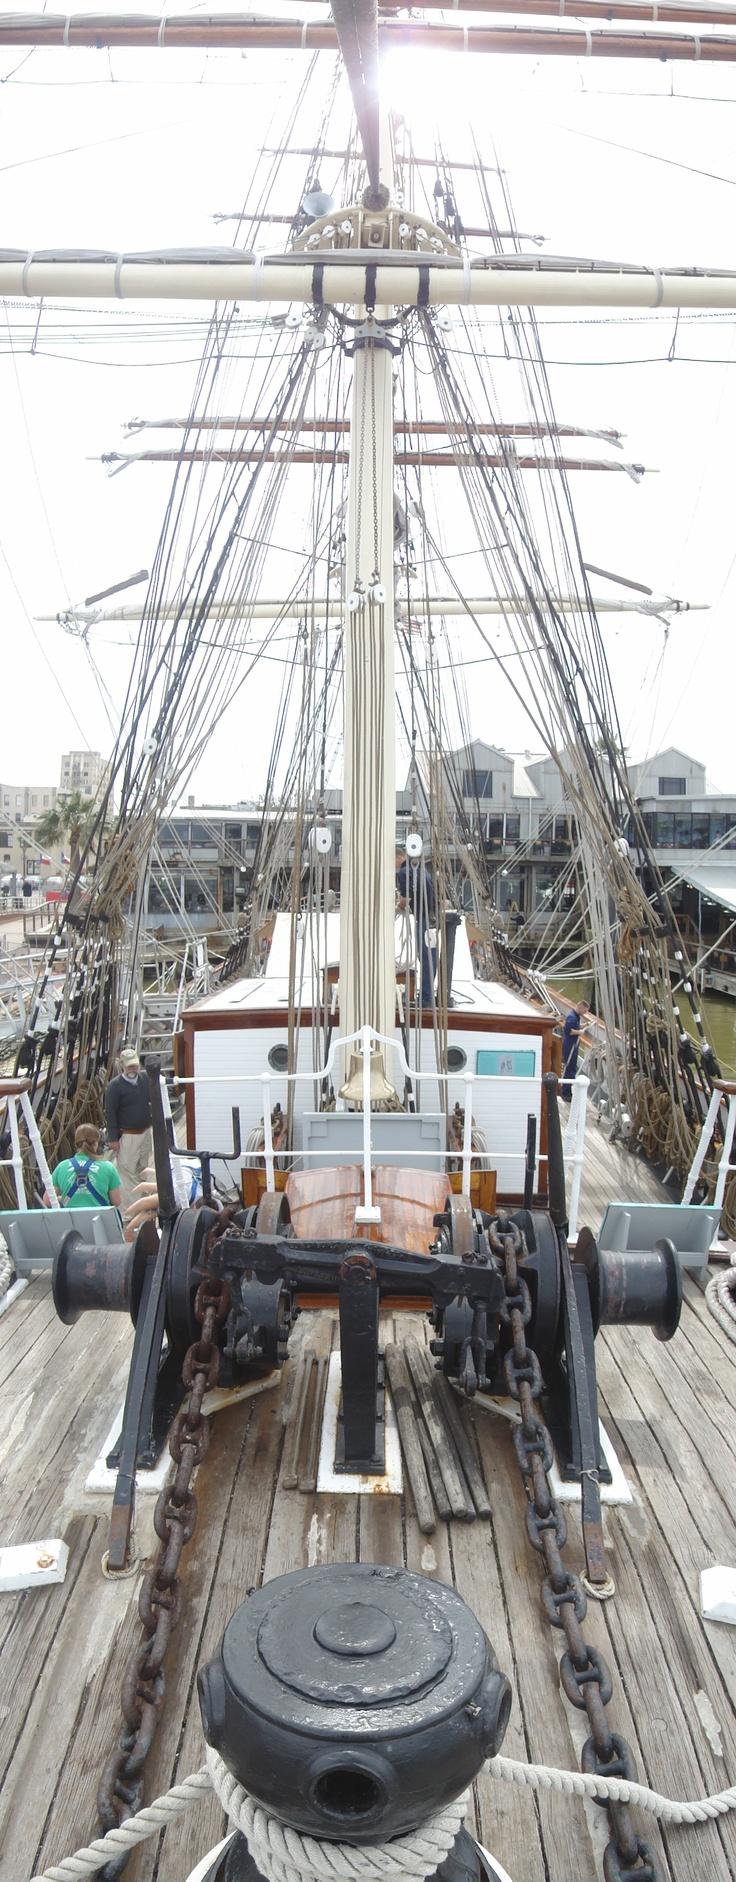 1622 Best Super Voilier Images On Pinterest  Sailing -4433